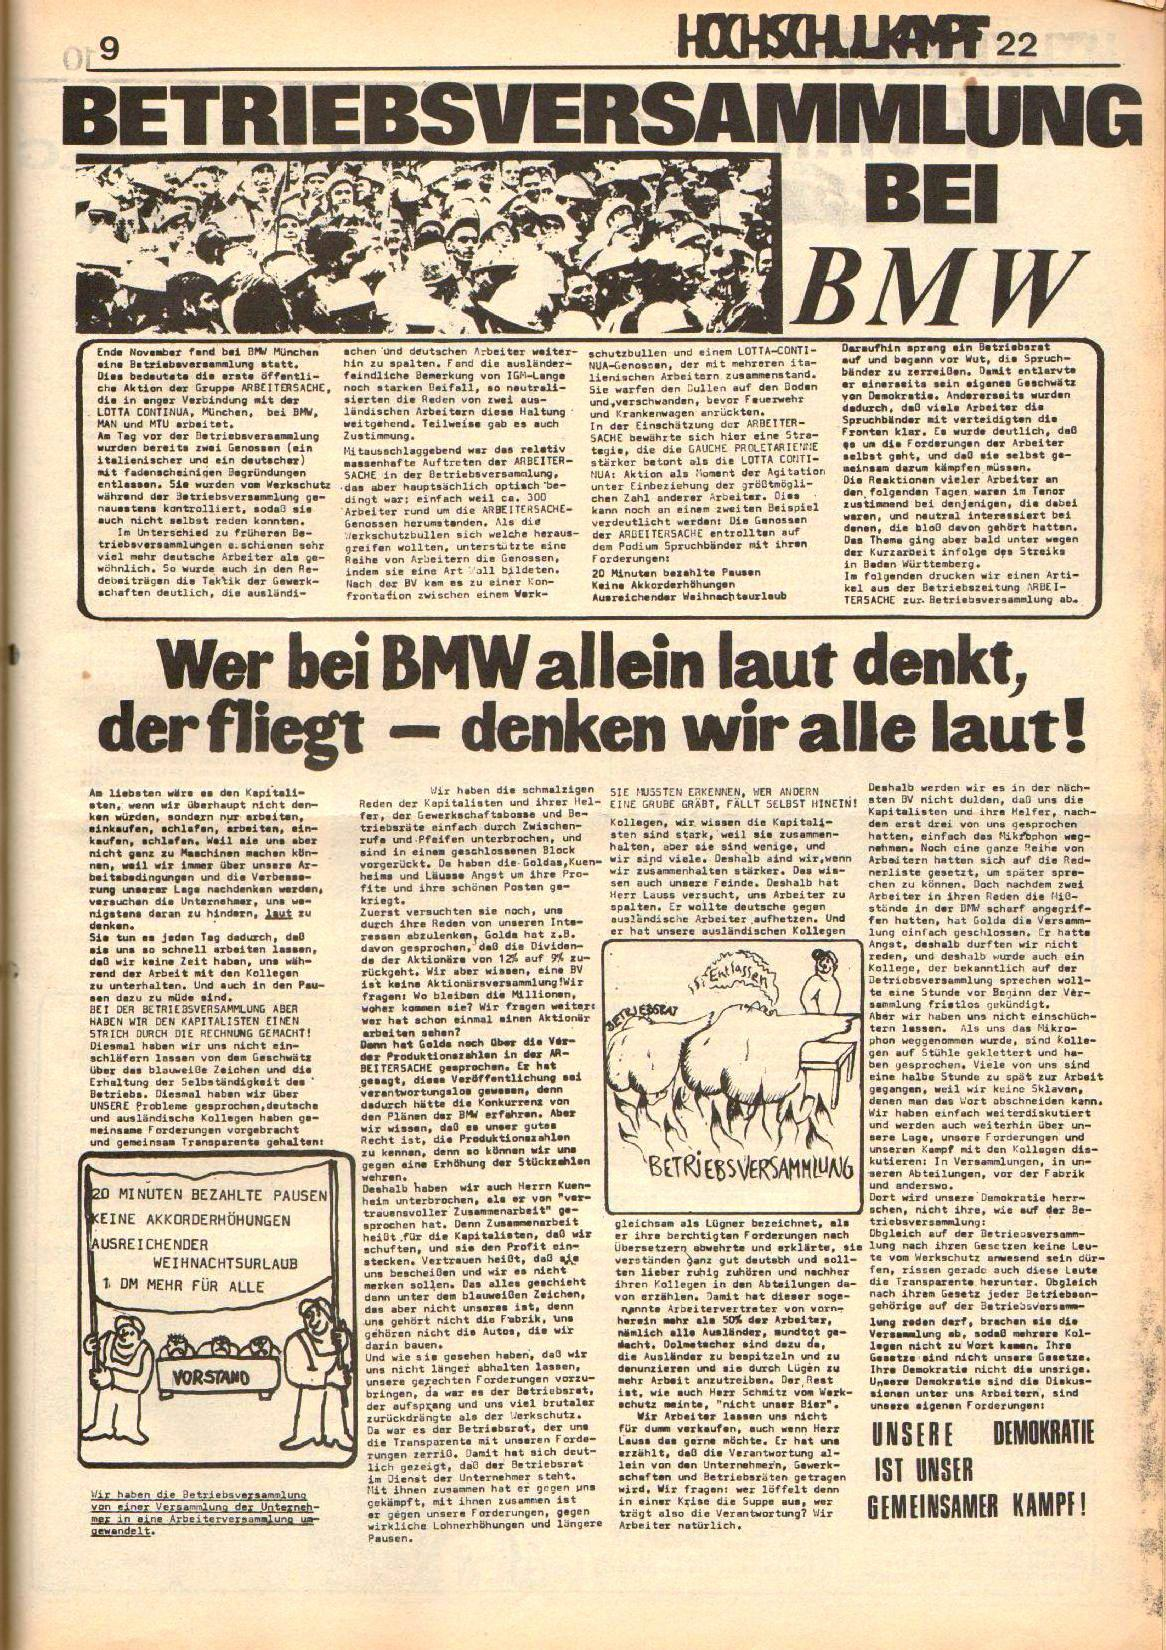 Berlin_Hochschulkampf_1971_22_09